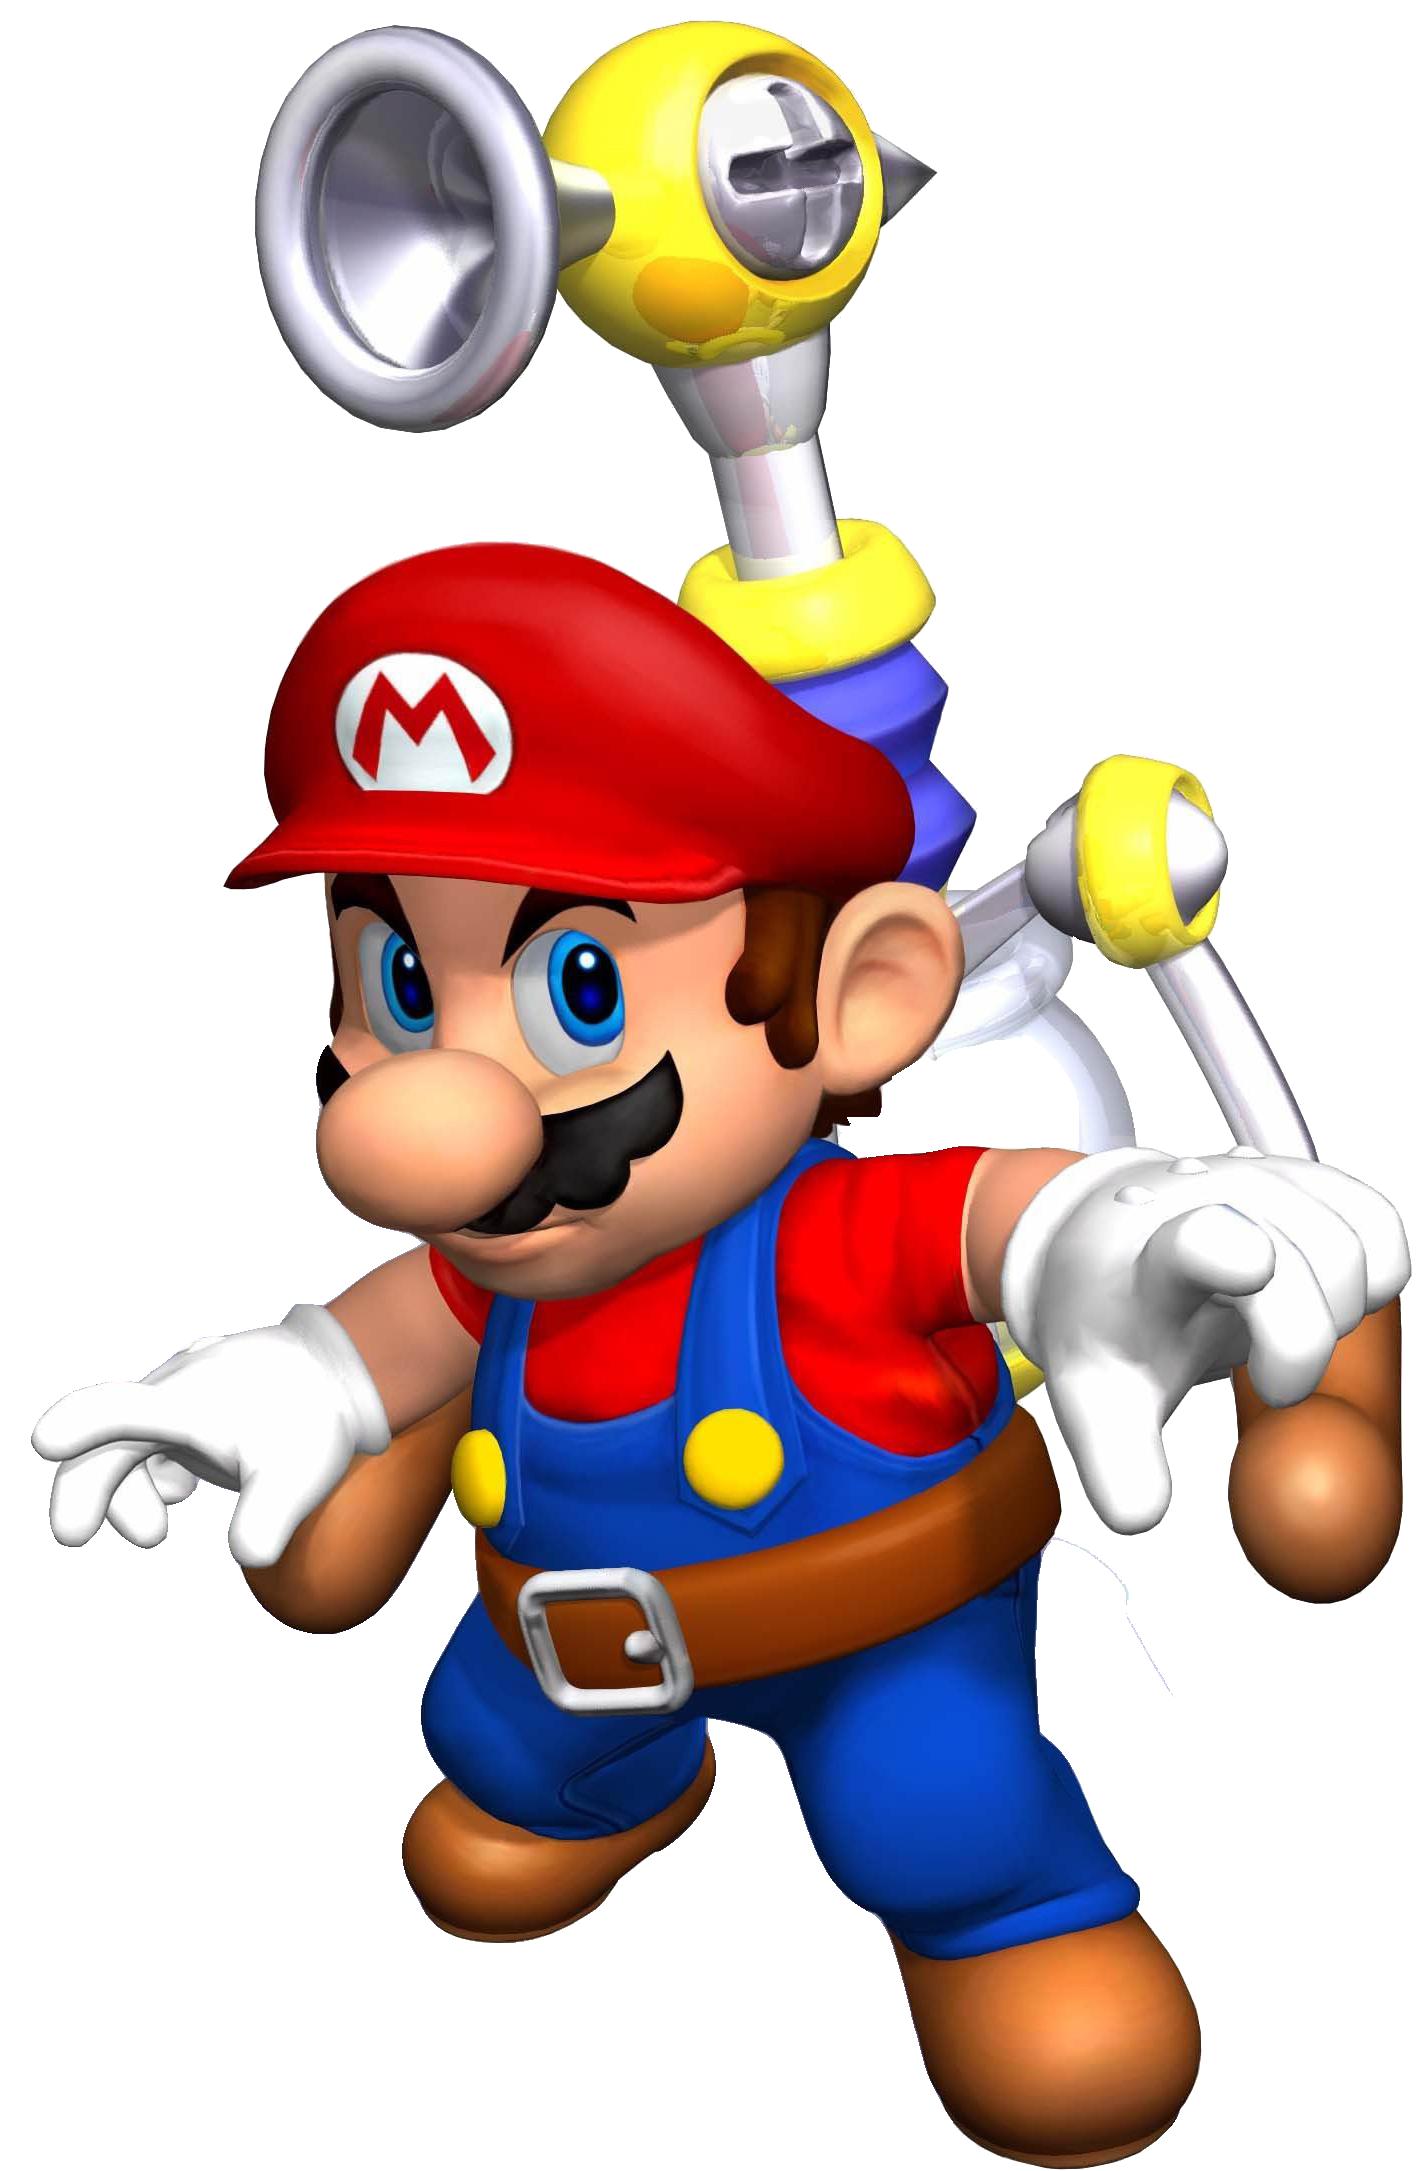 Image Result For Super Paper Mario Wiki